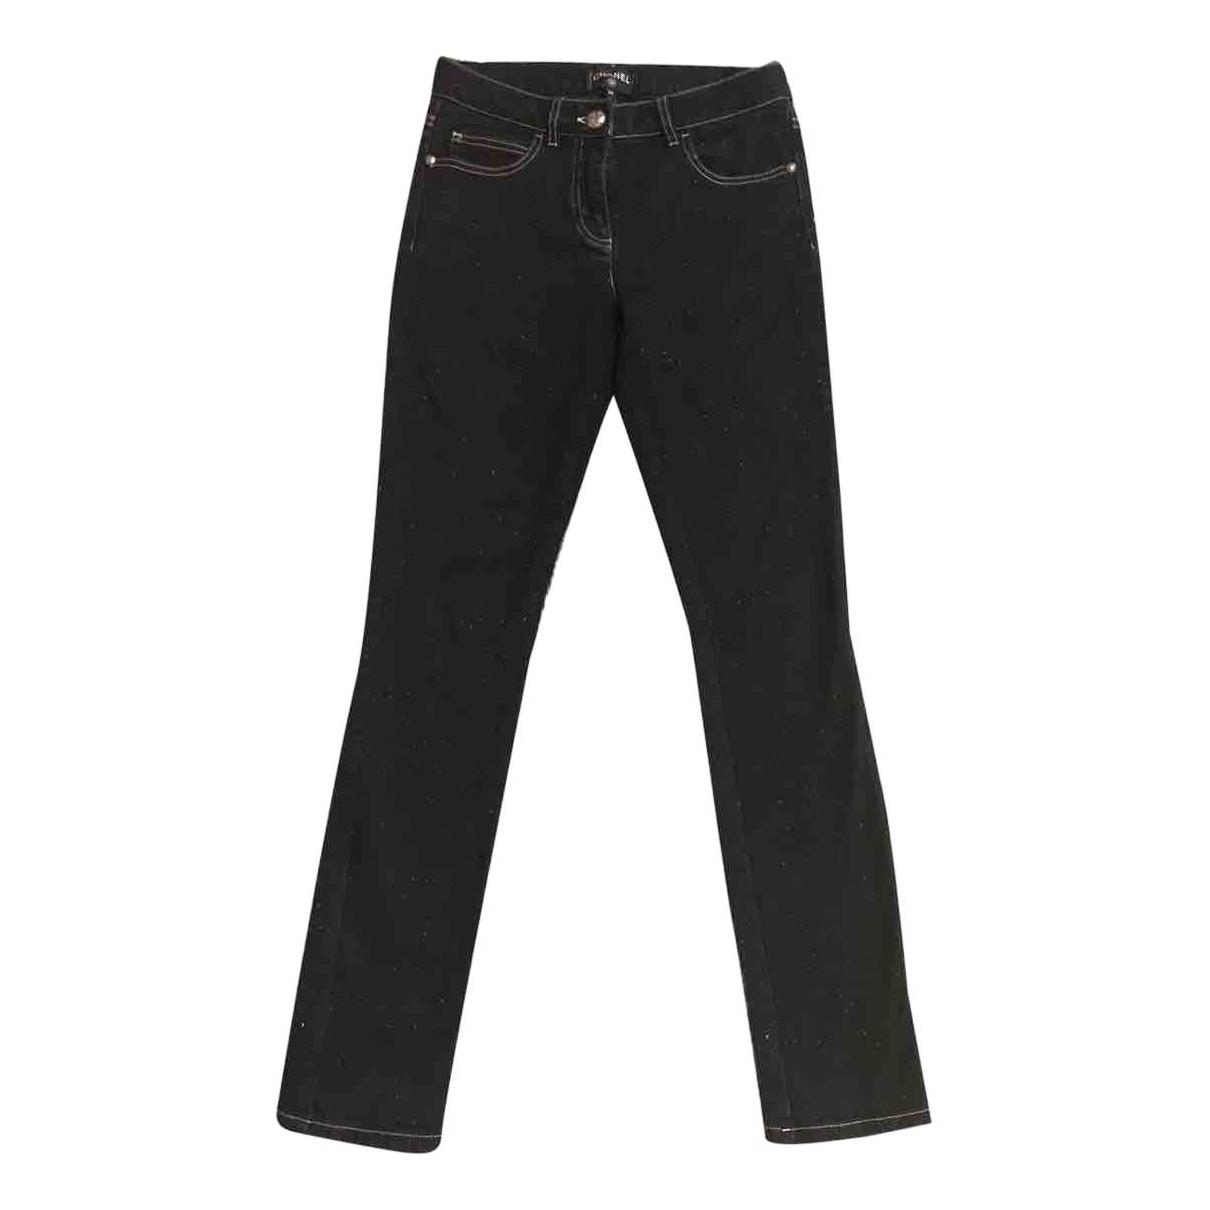 Chanel N Black Denim - Jeans Jeans for Women 34 FR